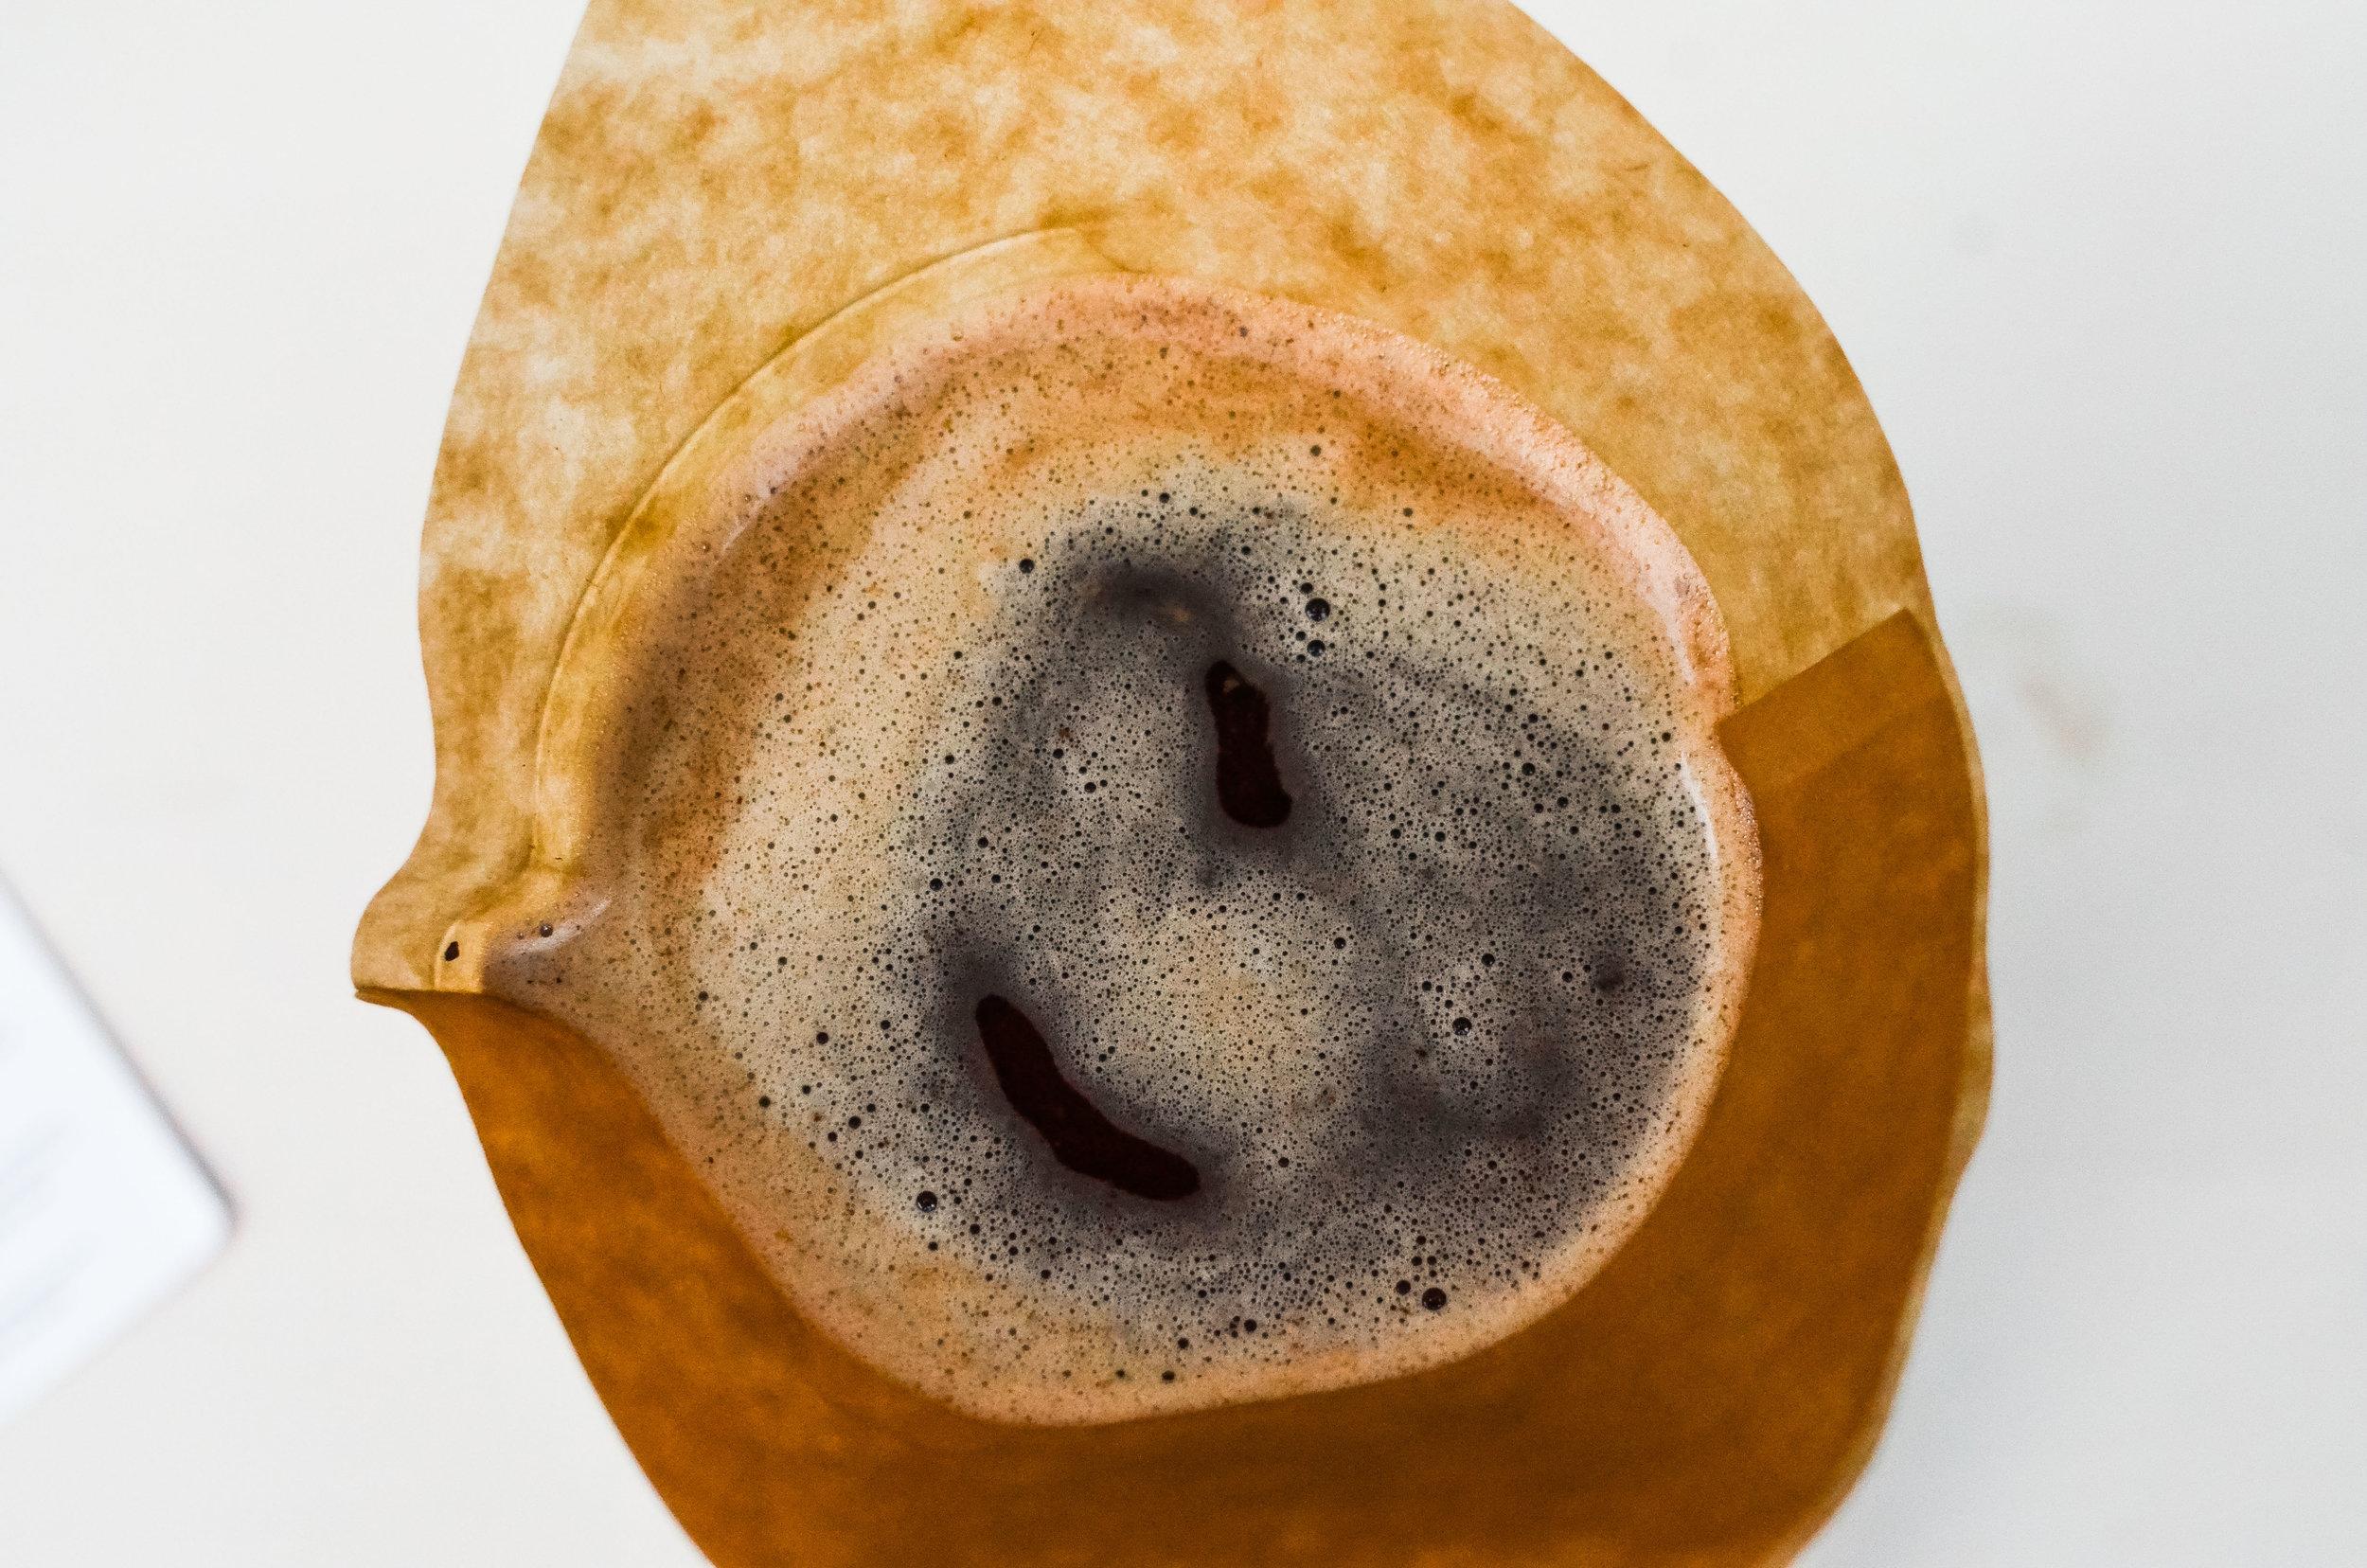 Wendling_Boyd_Trade_Coffee_Co_Spyhouse_Coffee-12.jpg